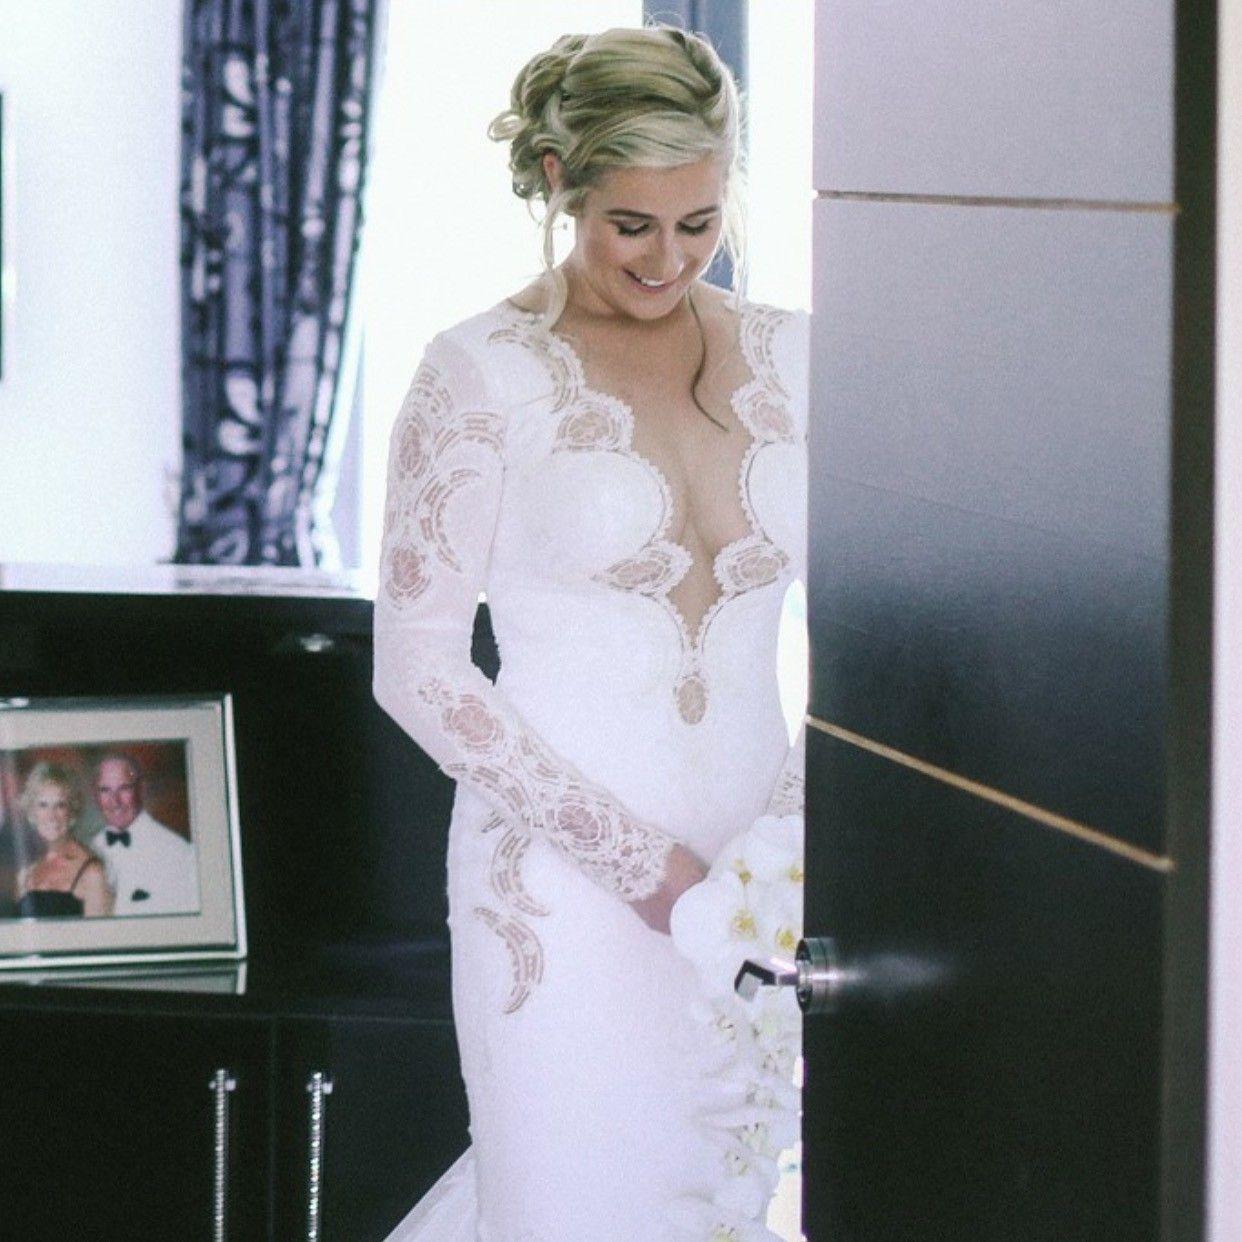 Berta Bridal 14 30 Used Wedding Dress Still White